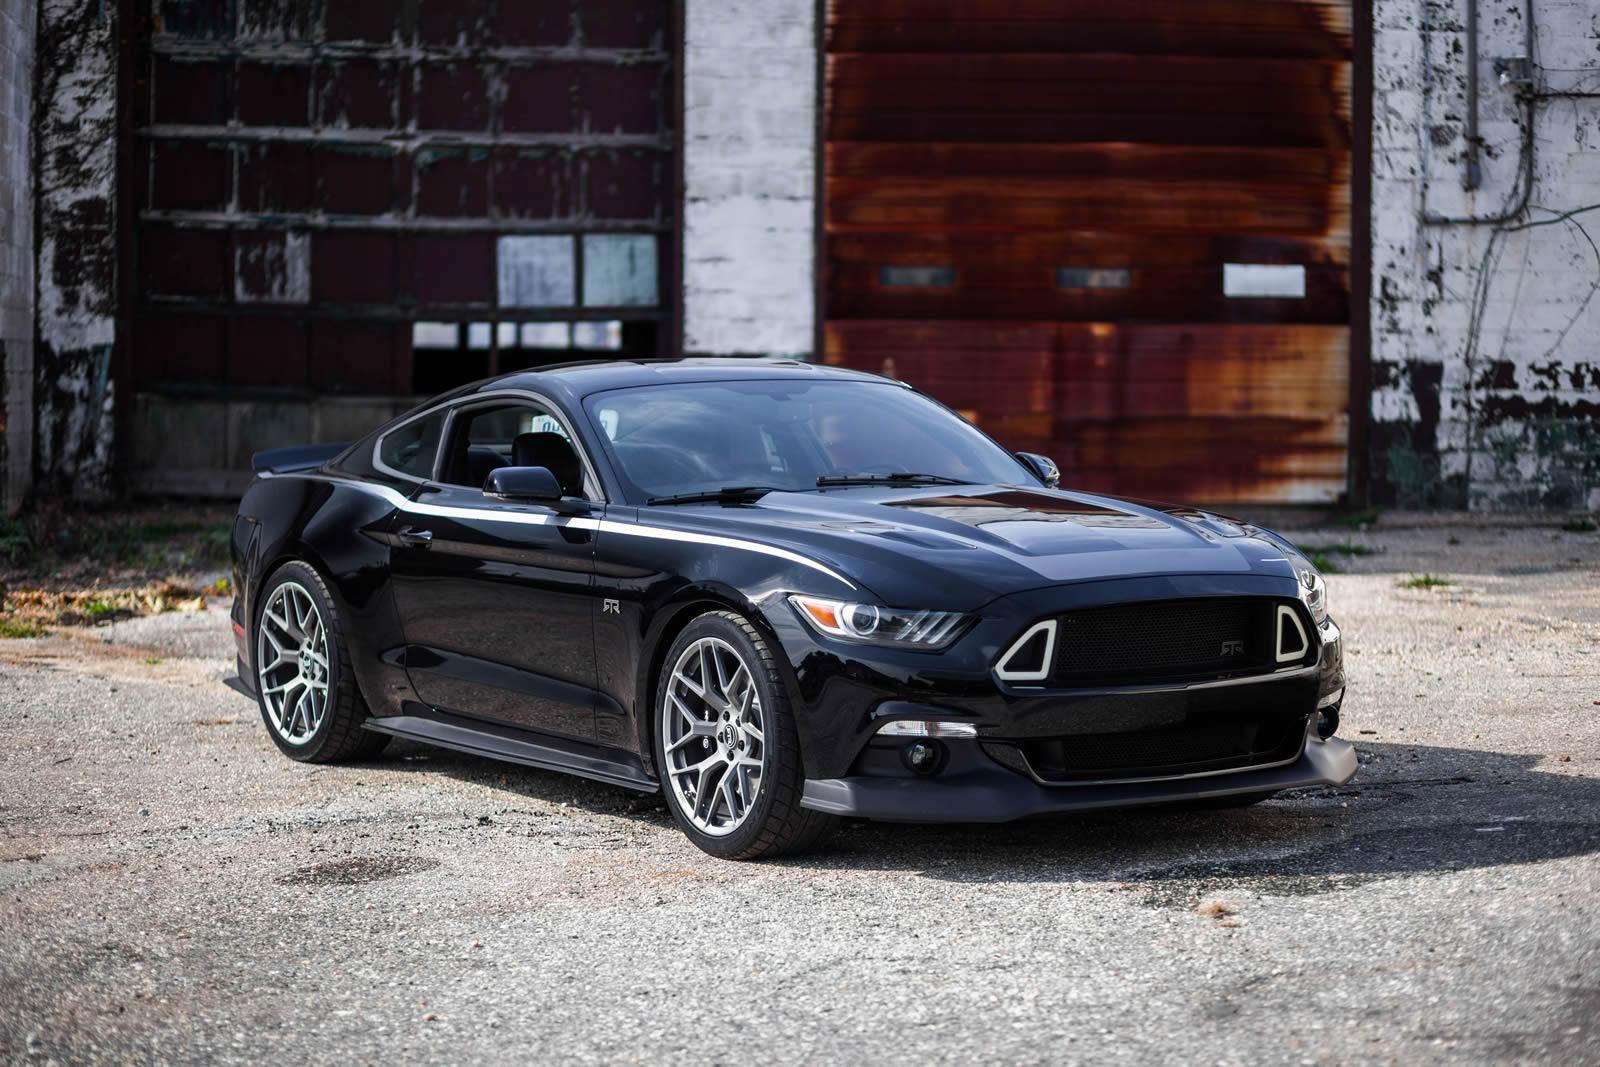 New Mustang RTR amazing Pinterest